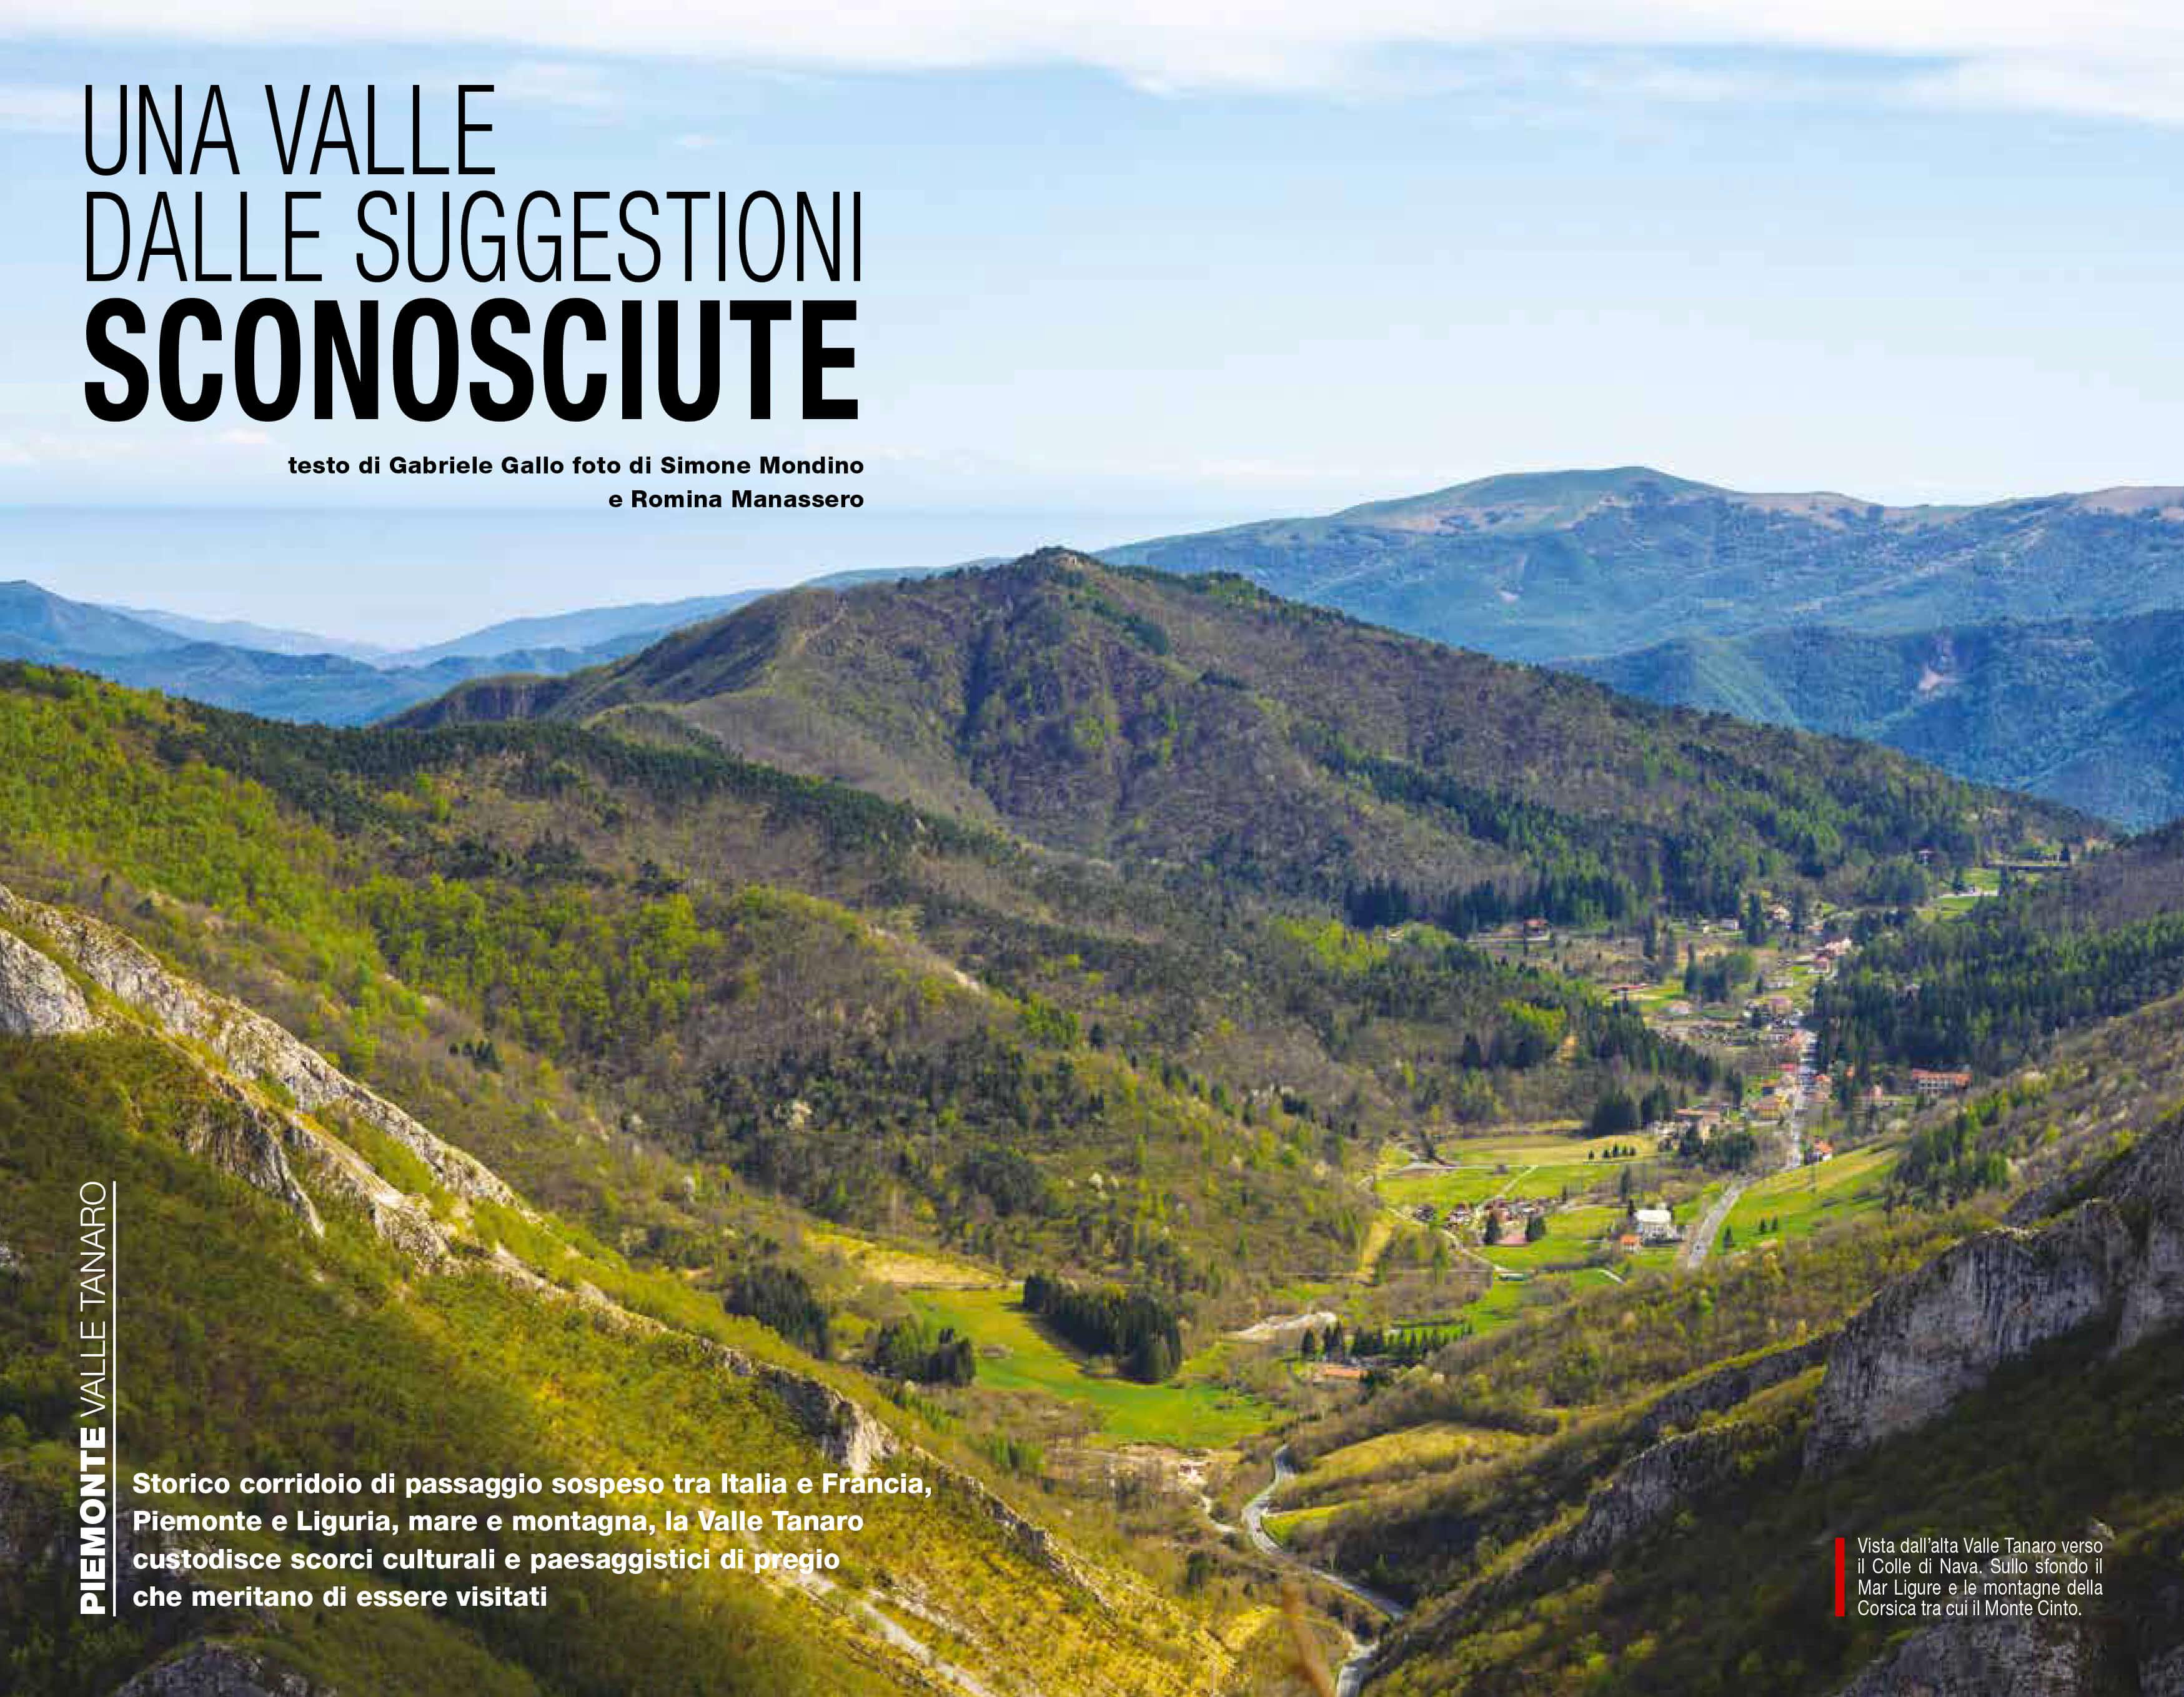 Valle Tanaro - Itinerari e Luoghi